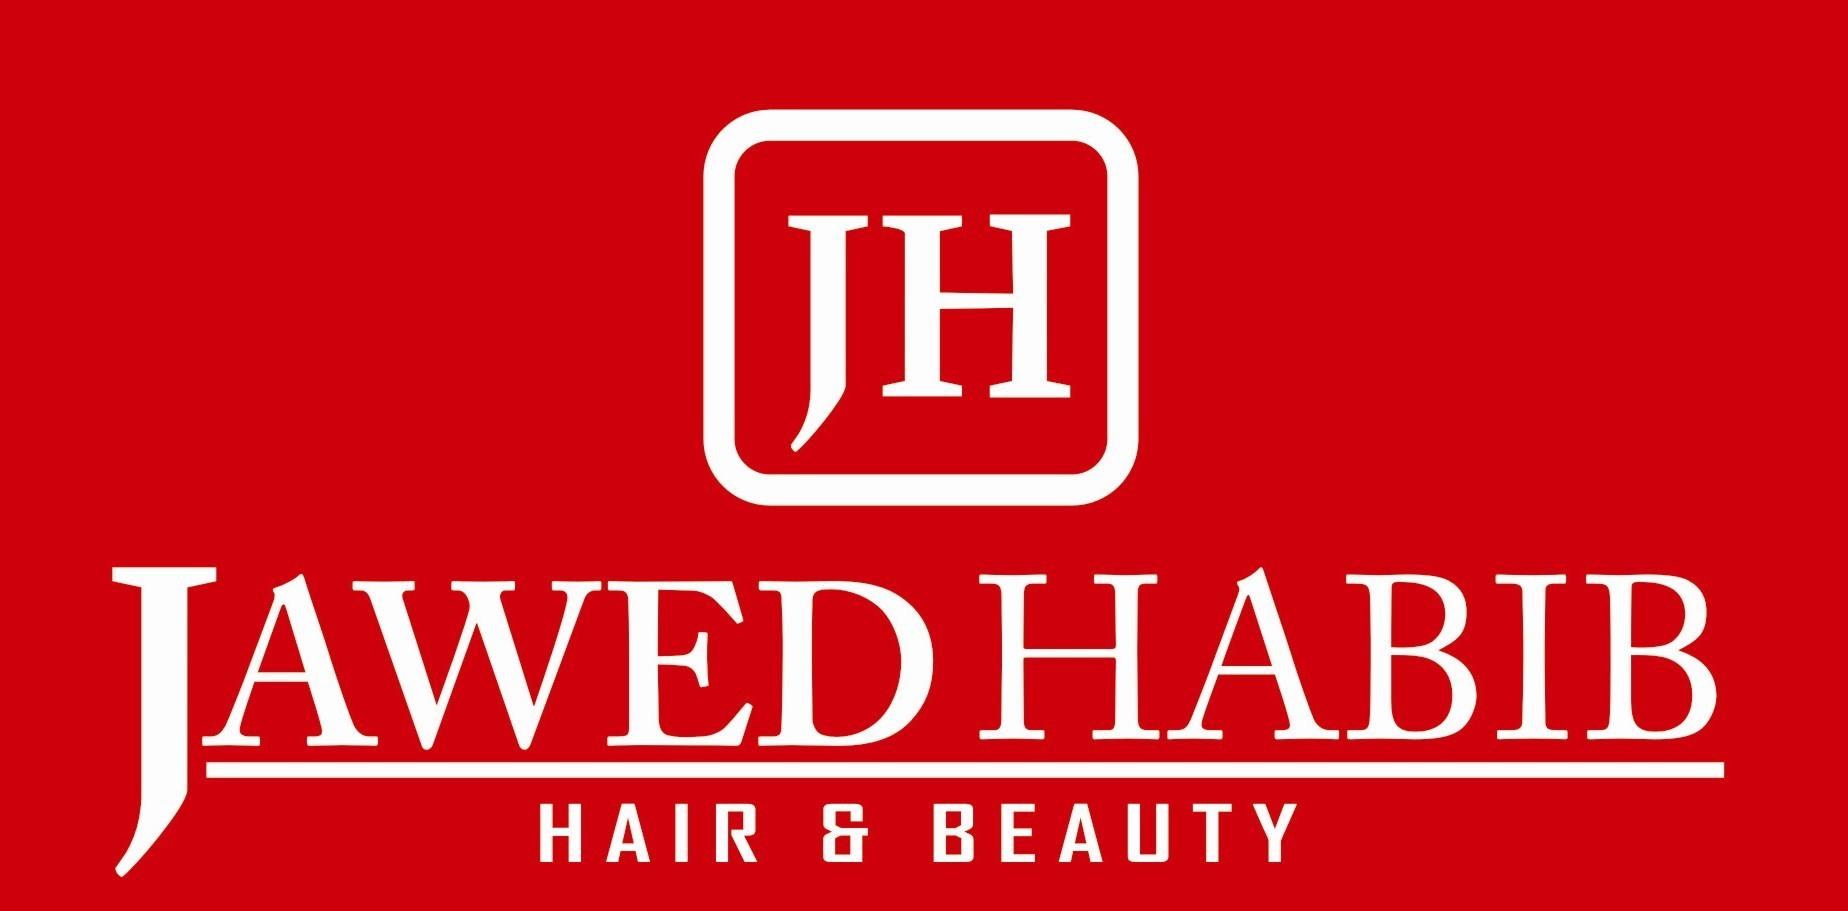 Jawed Habib Hair & Beauty Salons - Srinagar Colony - Hyderabad Image